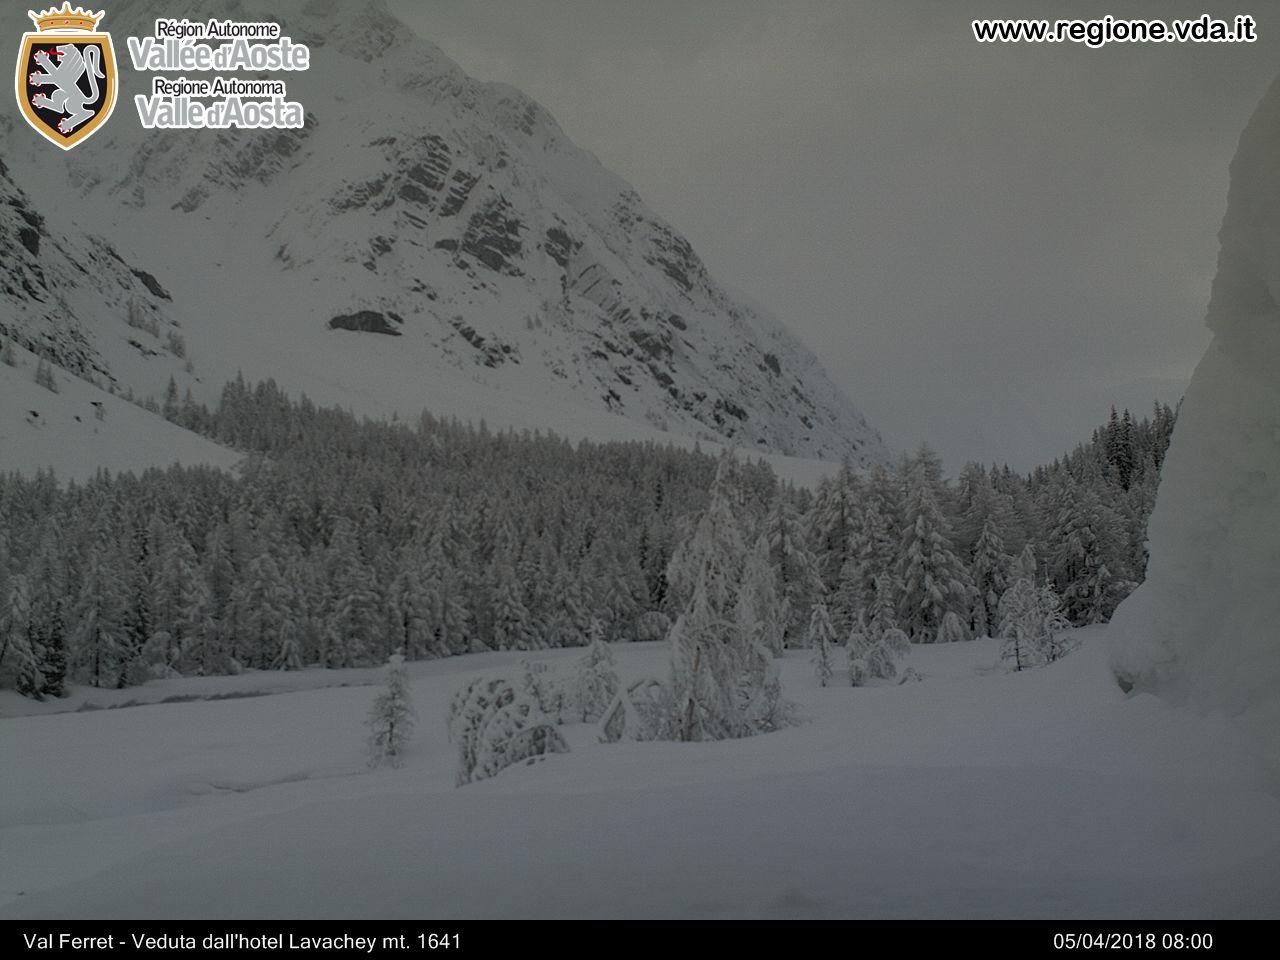 Valle d'Aosta - Primavera 2018-big_ferret2.jpg